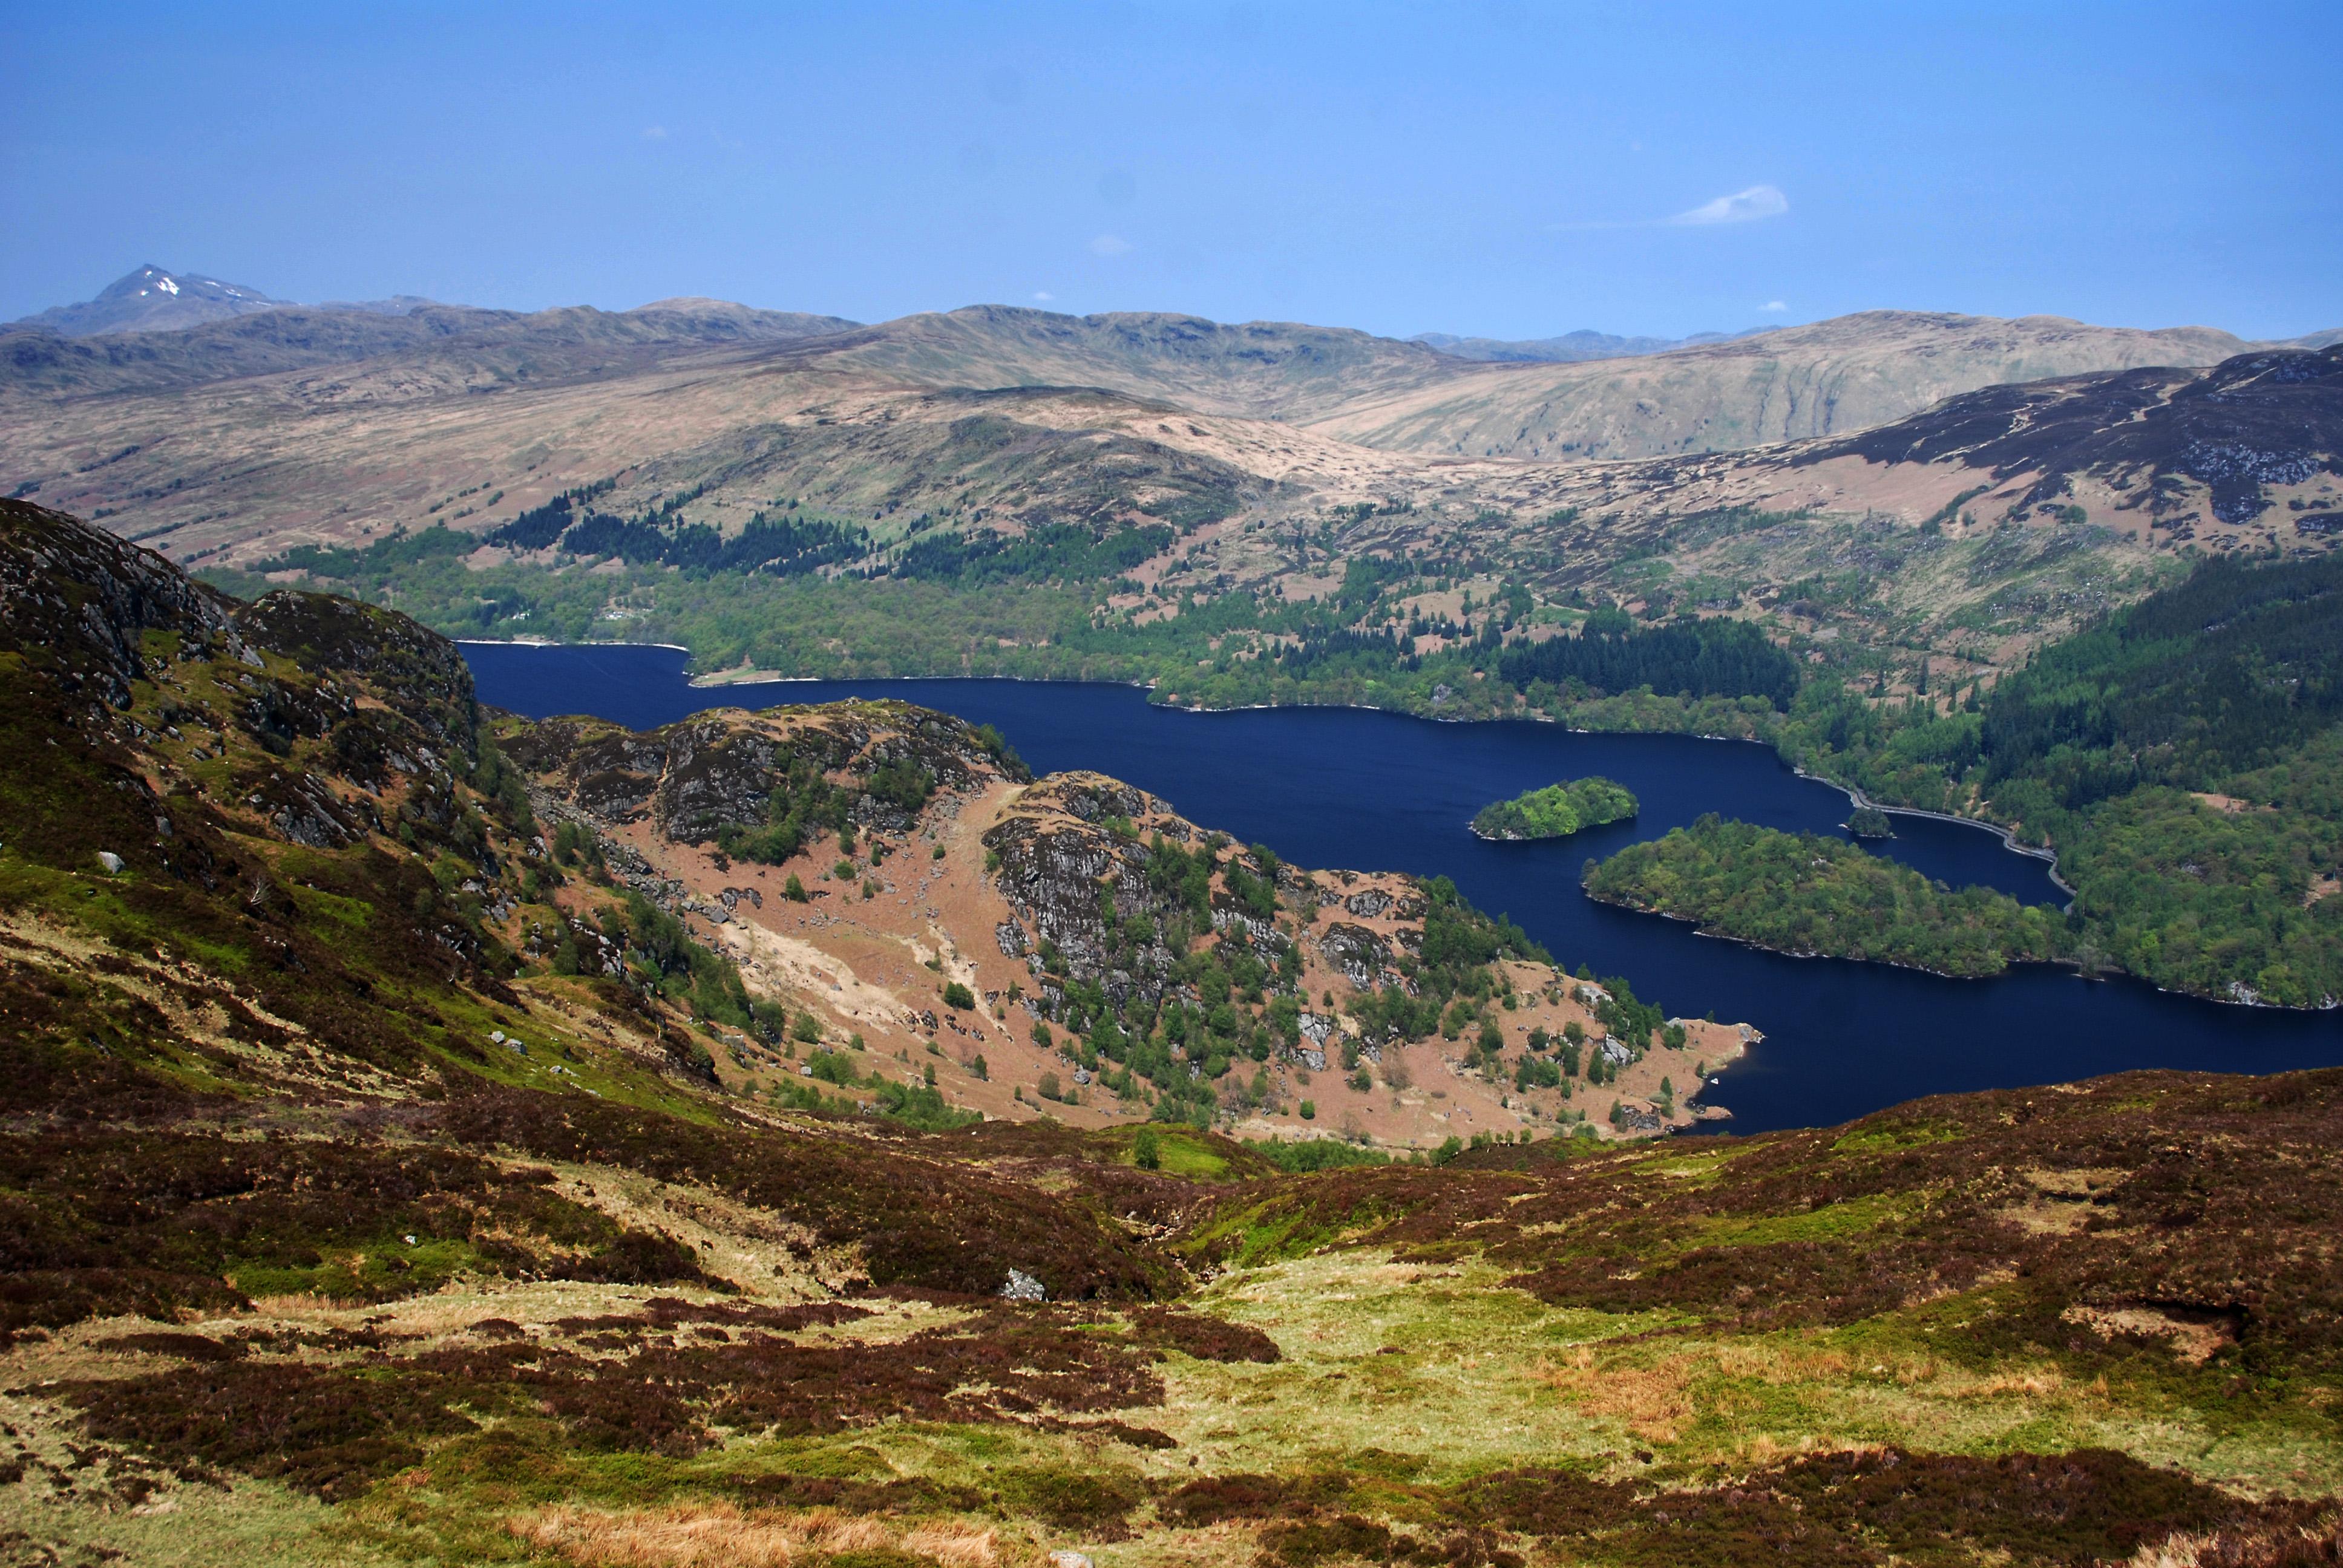 Loch Katrine Scotland Related Keywords & Suggestions - Loch Katrine ...